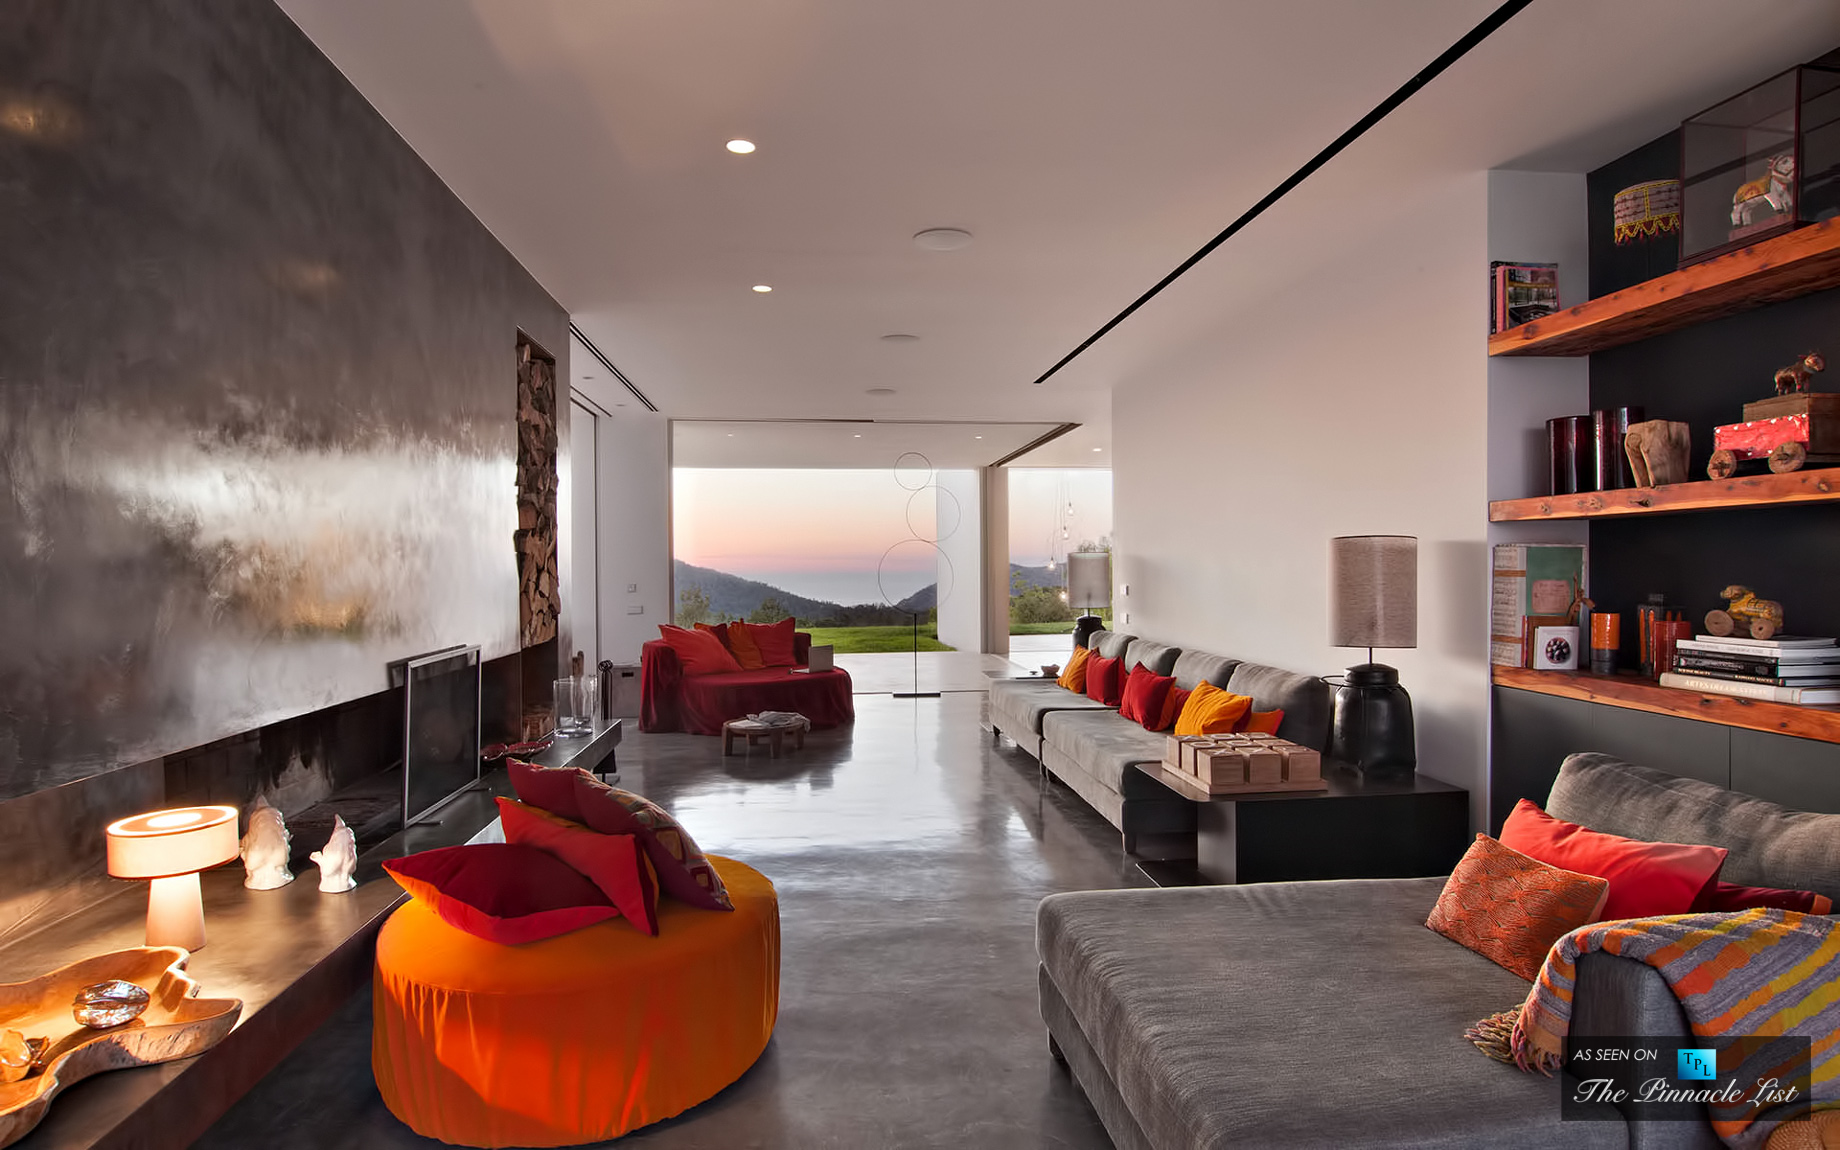 Villa Zia - Ibiza, Spain - The 5 Best Rural Villas in the Mediterranean for Luxury Retreats